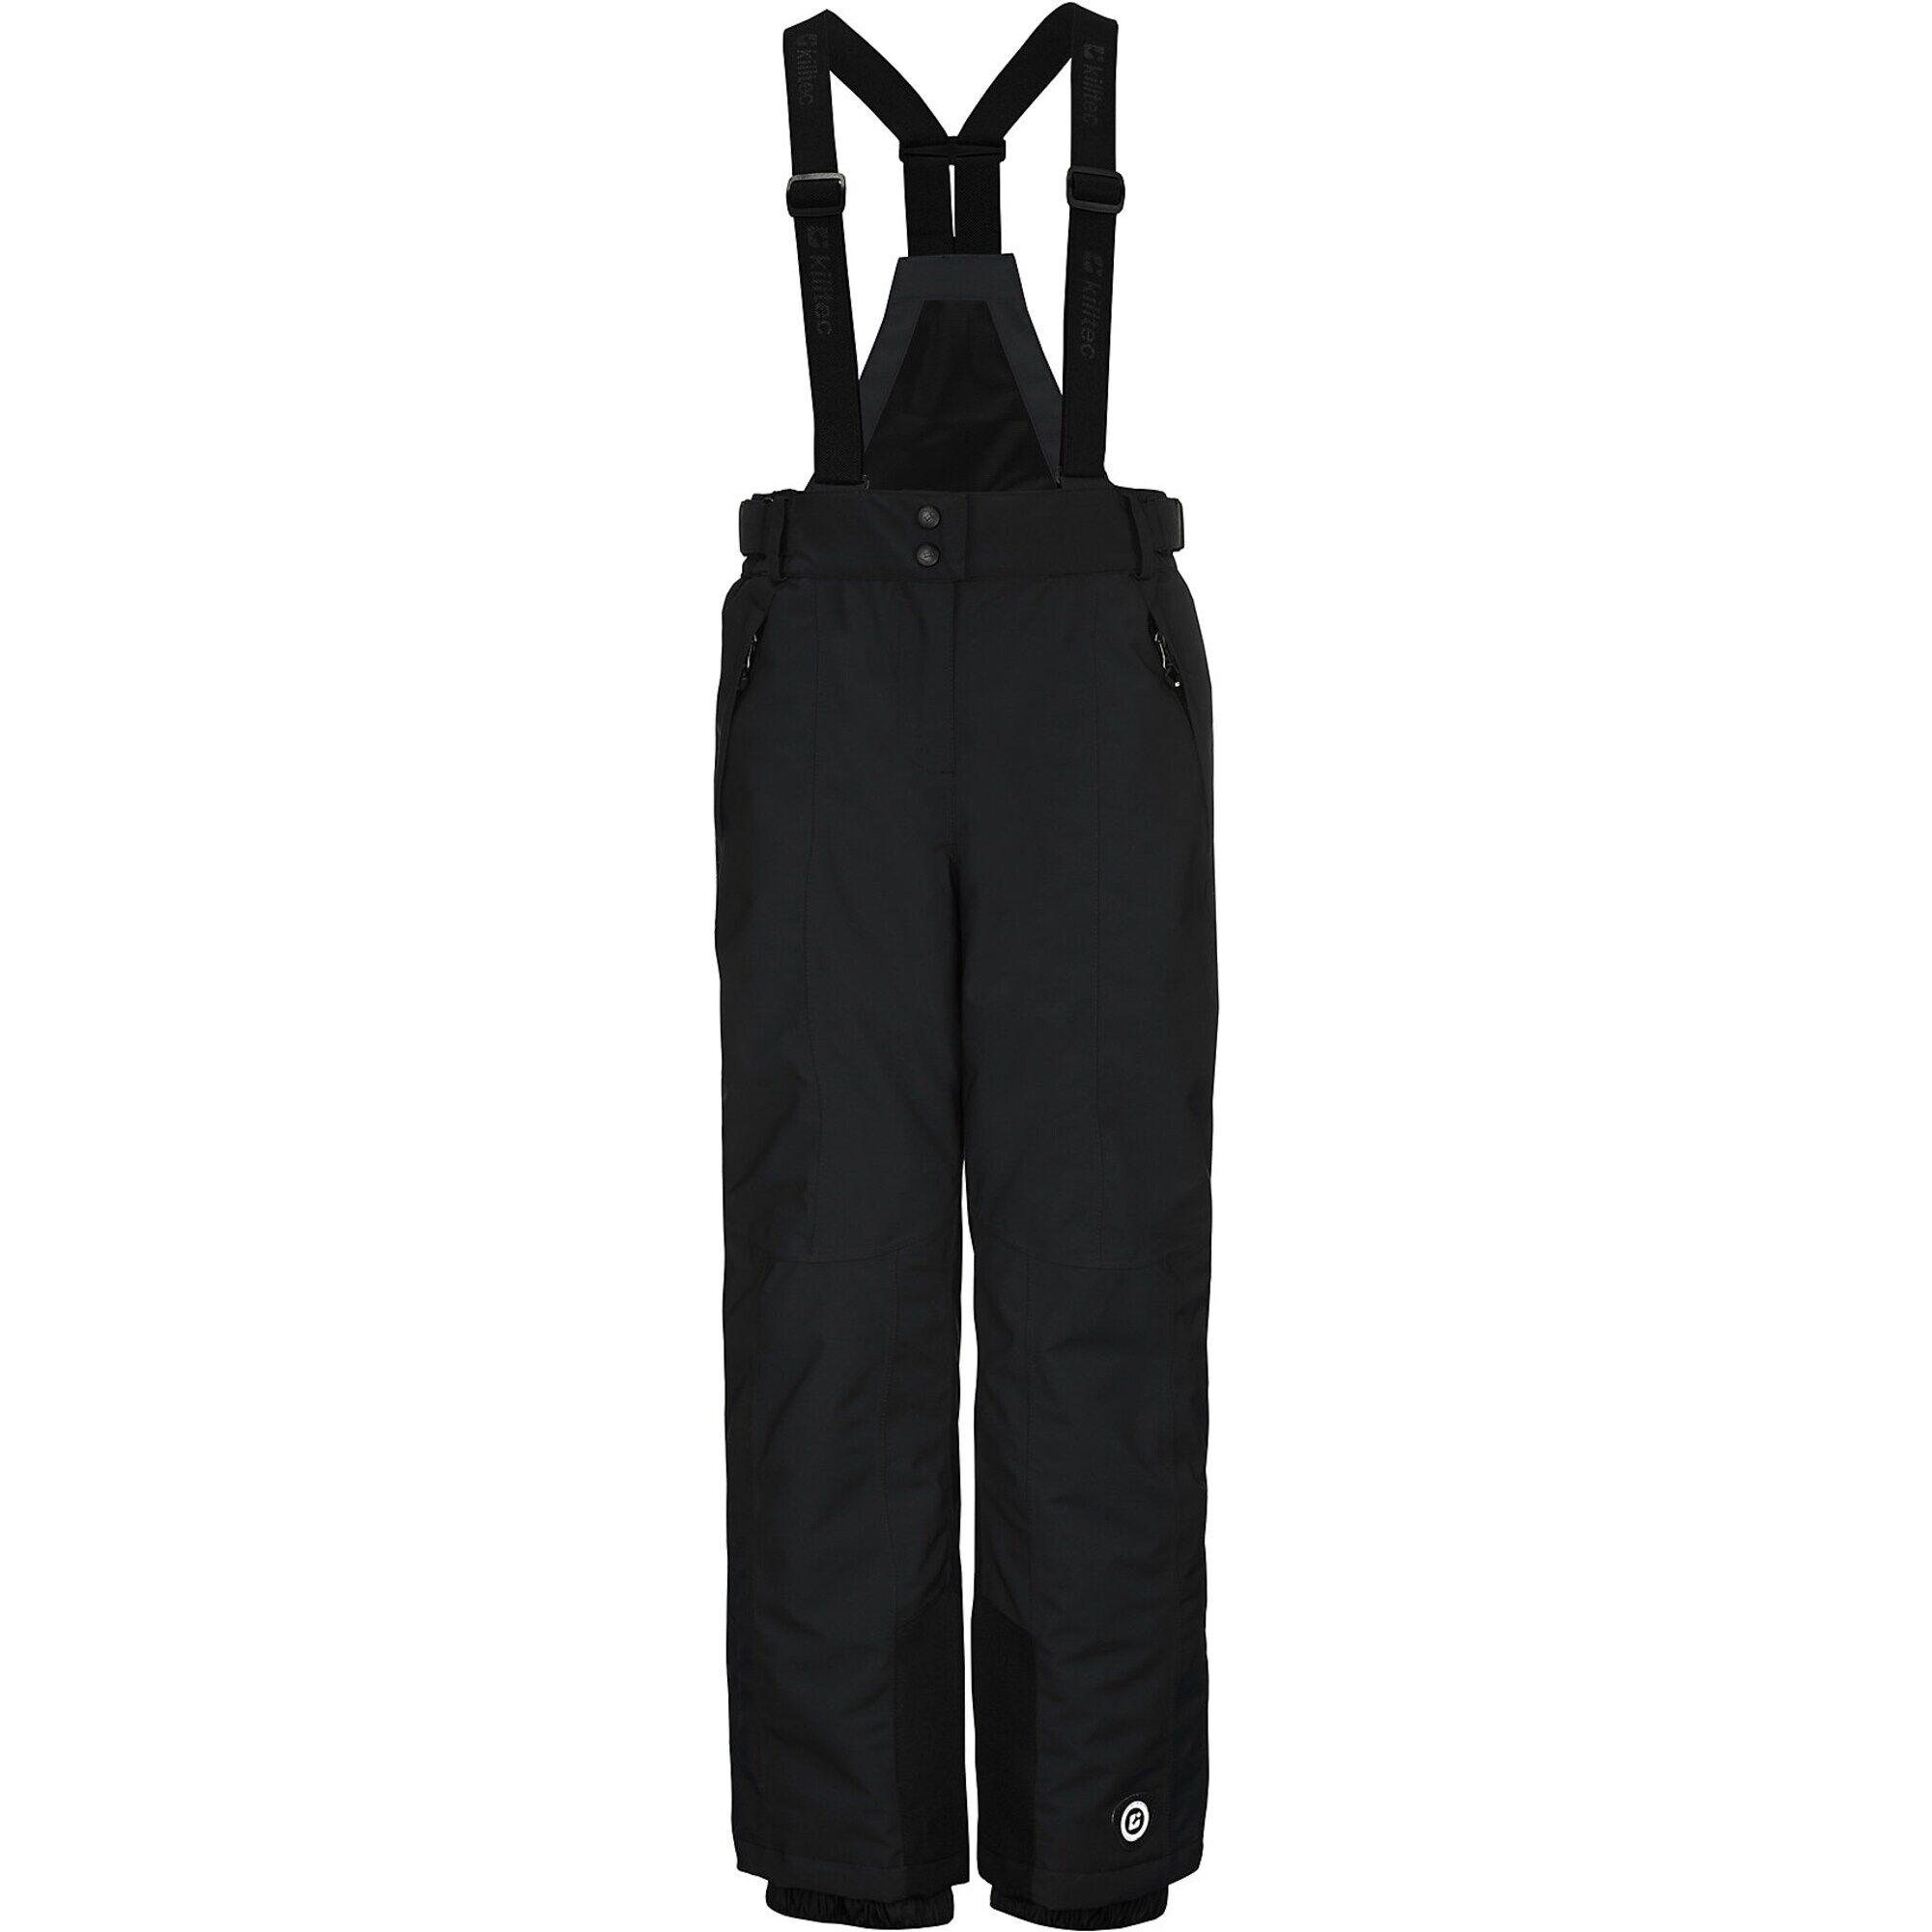 KILLTEC Pantalon de sport 'Gandara'  - Noir - Taille: 152 - girl